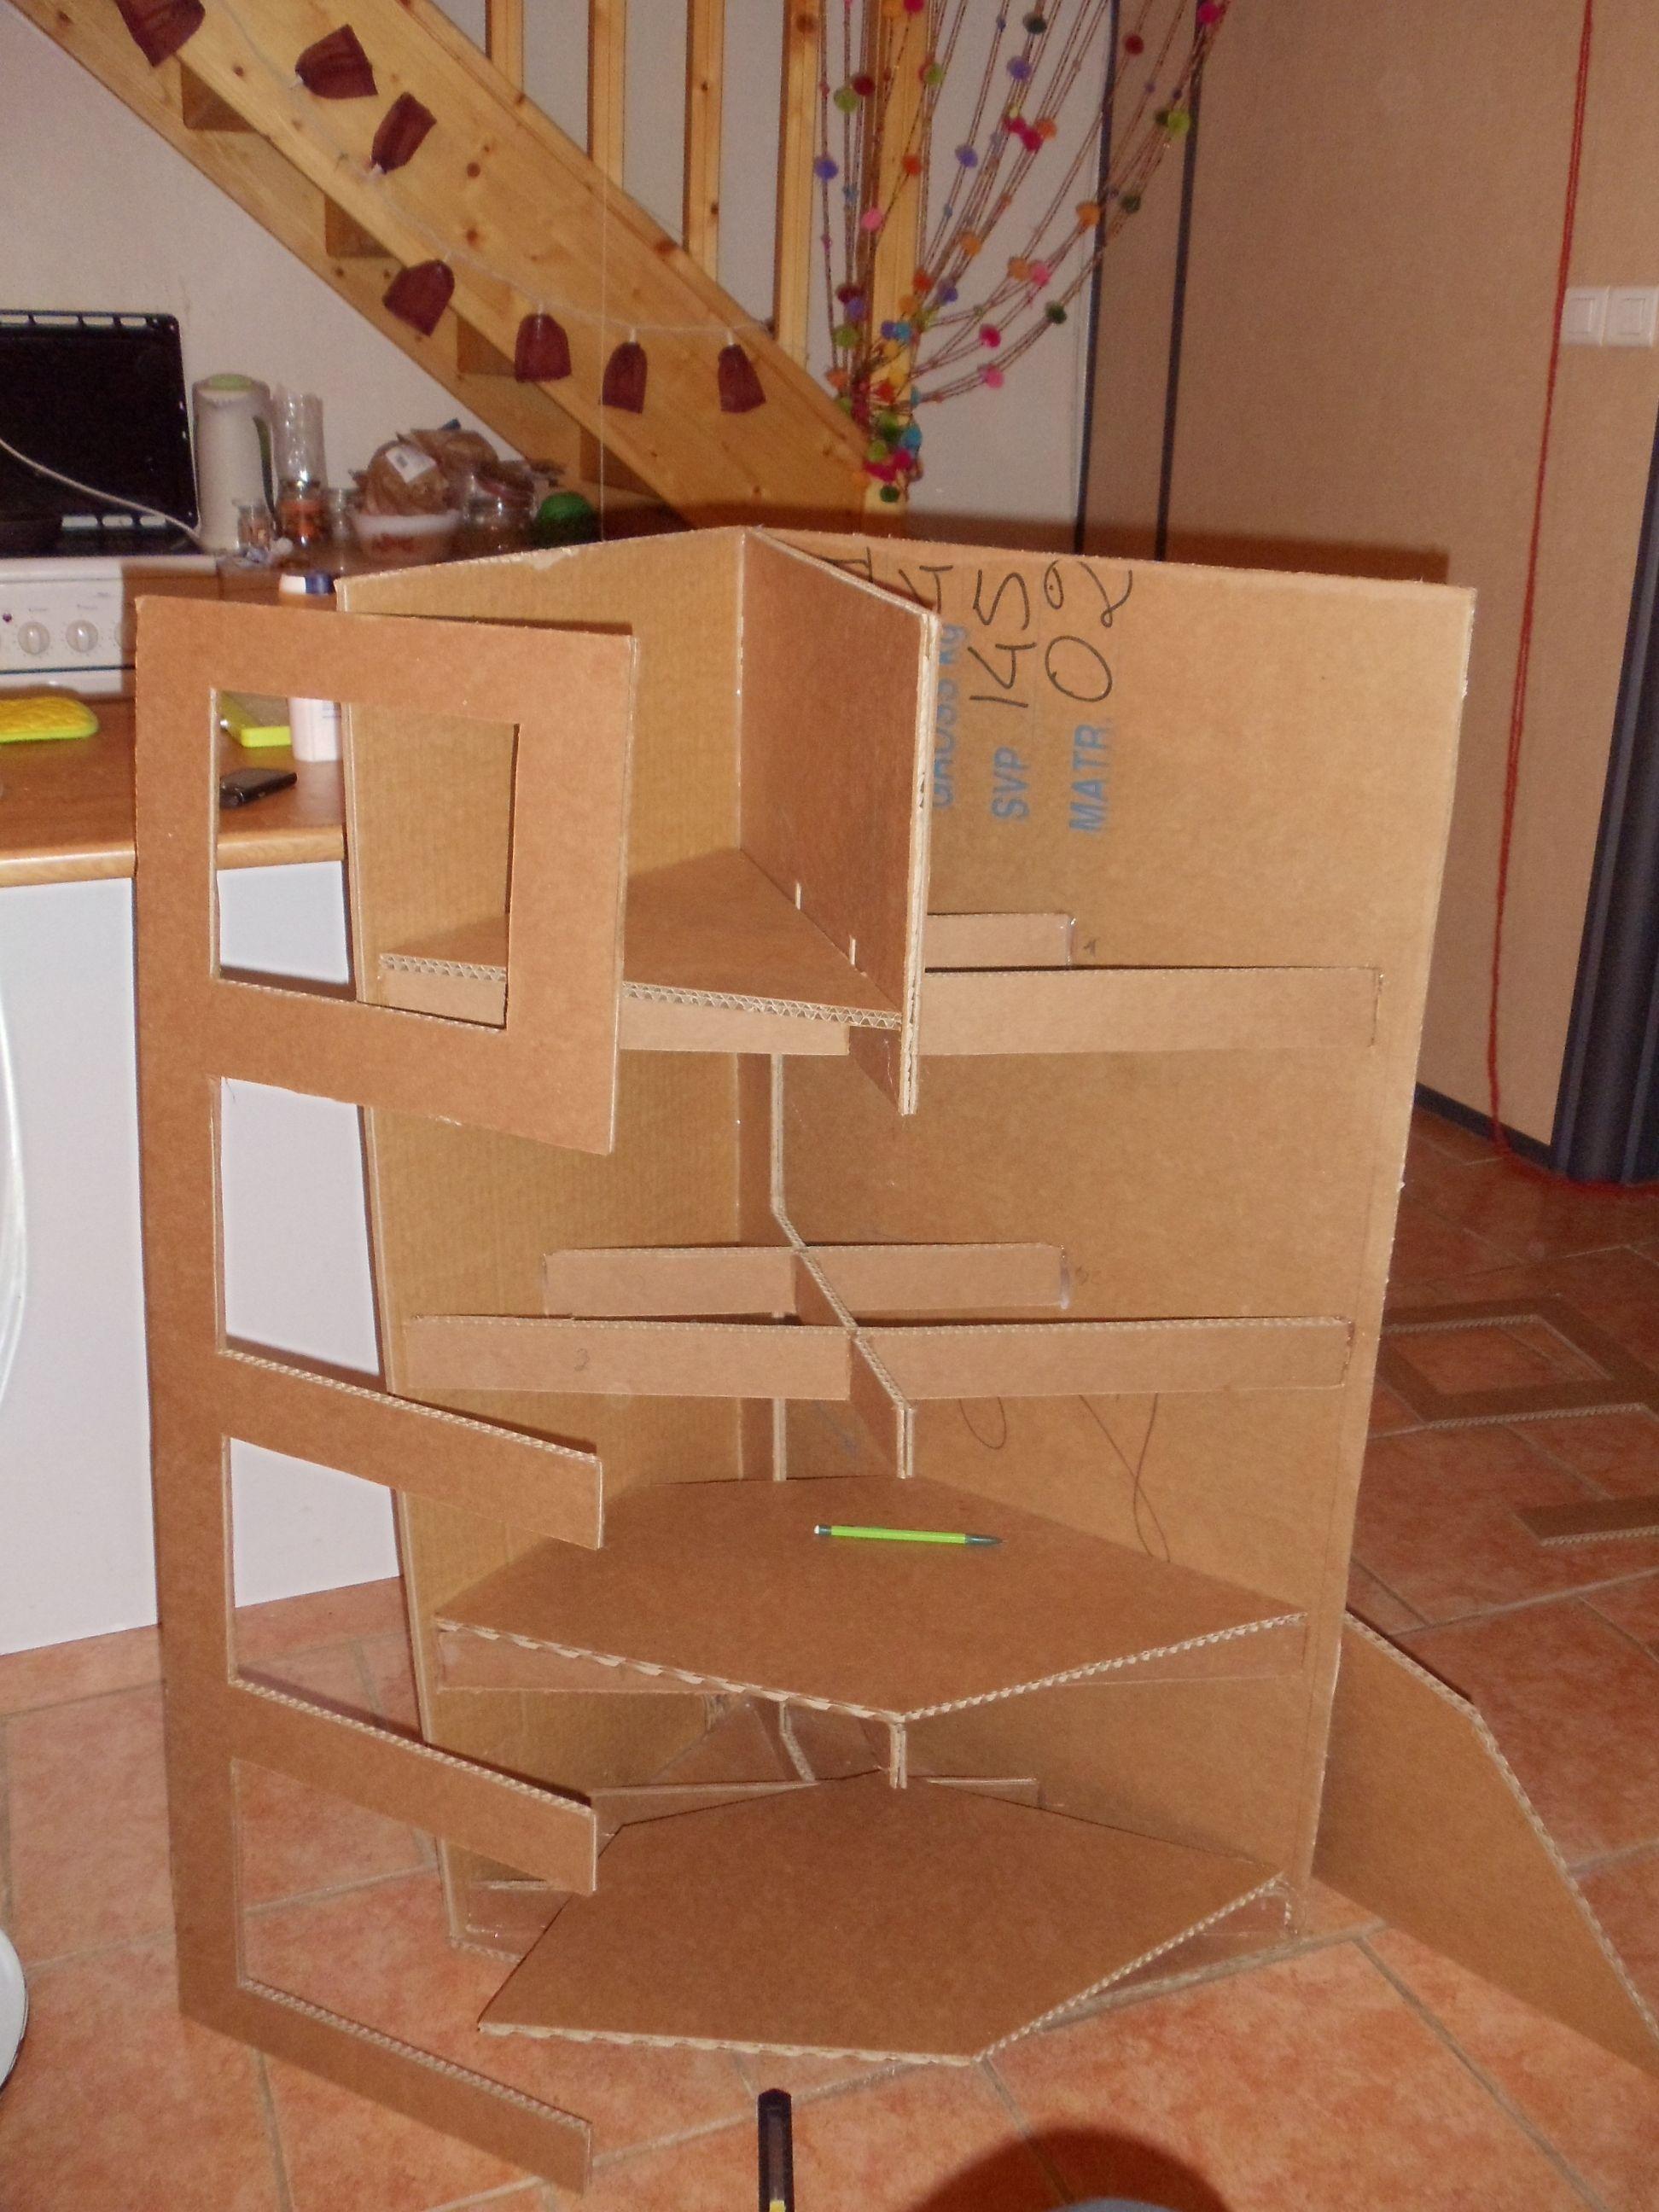 meuble angle methode embourdage carton techniques pinterest meuble en carton carton et. Black Bedroom Furniture Sets. Home Design Ideas